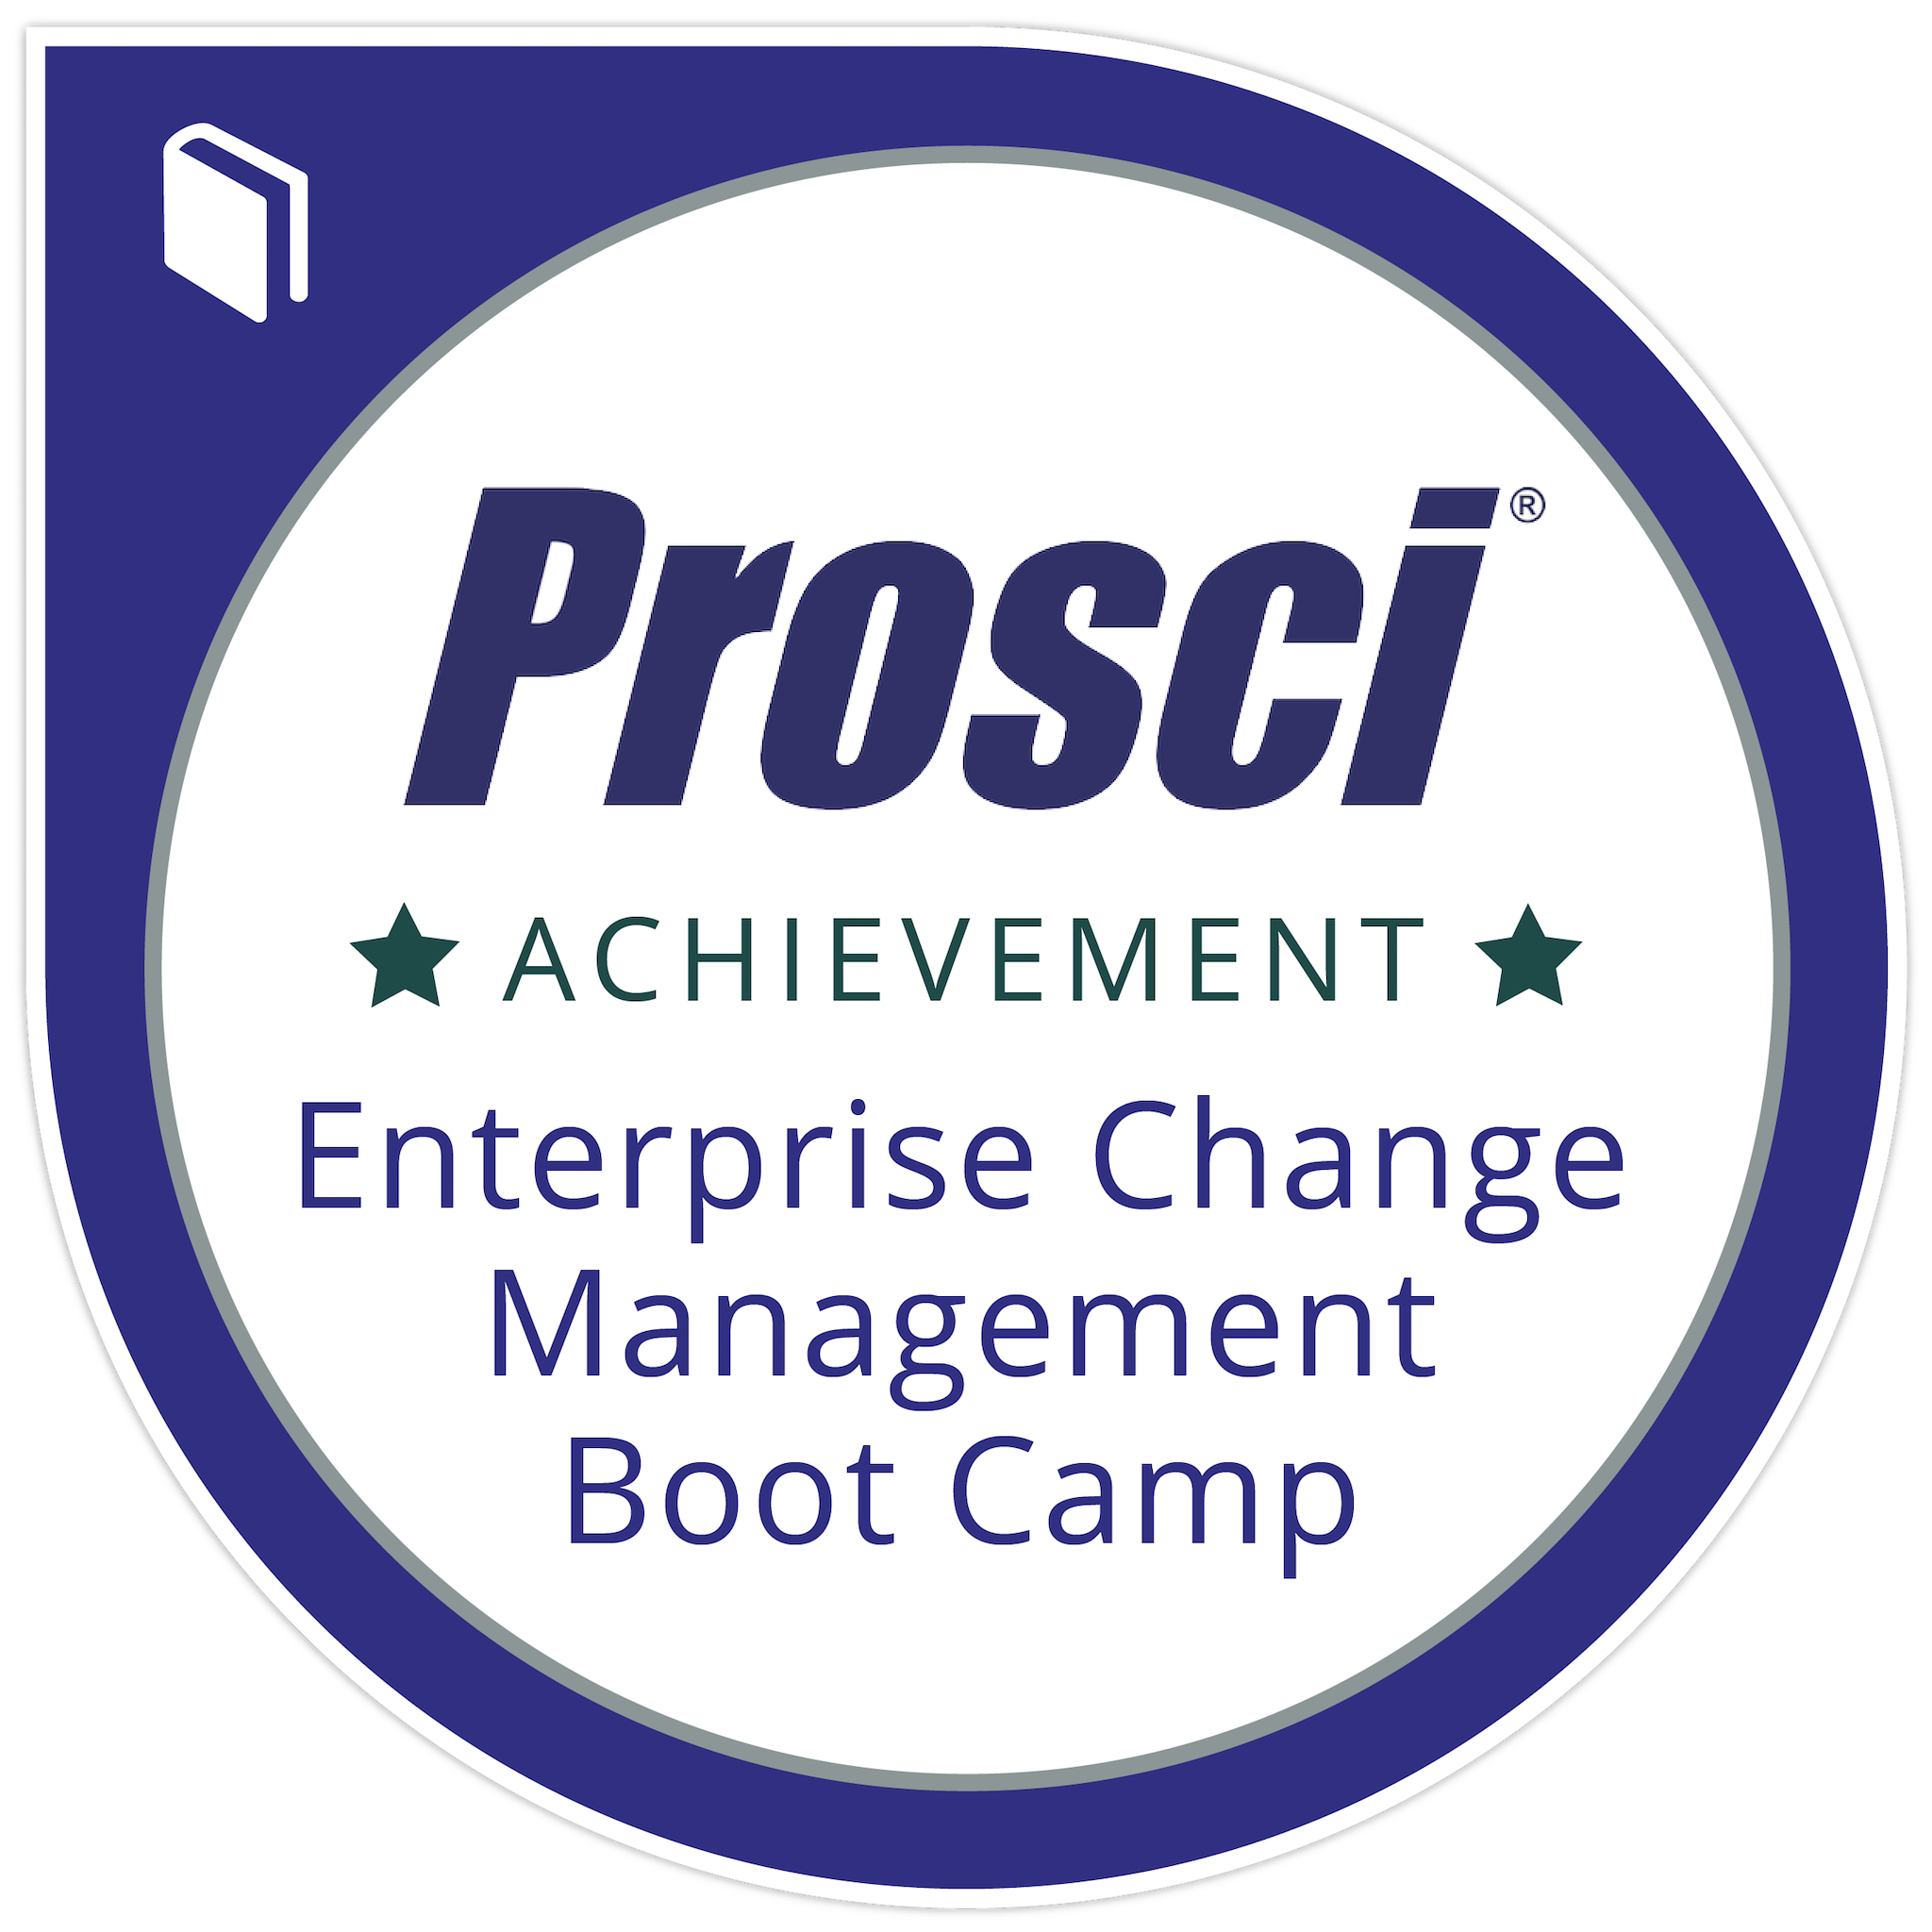 Prosci® Enterprise Change Management Boot Camp